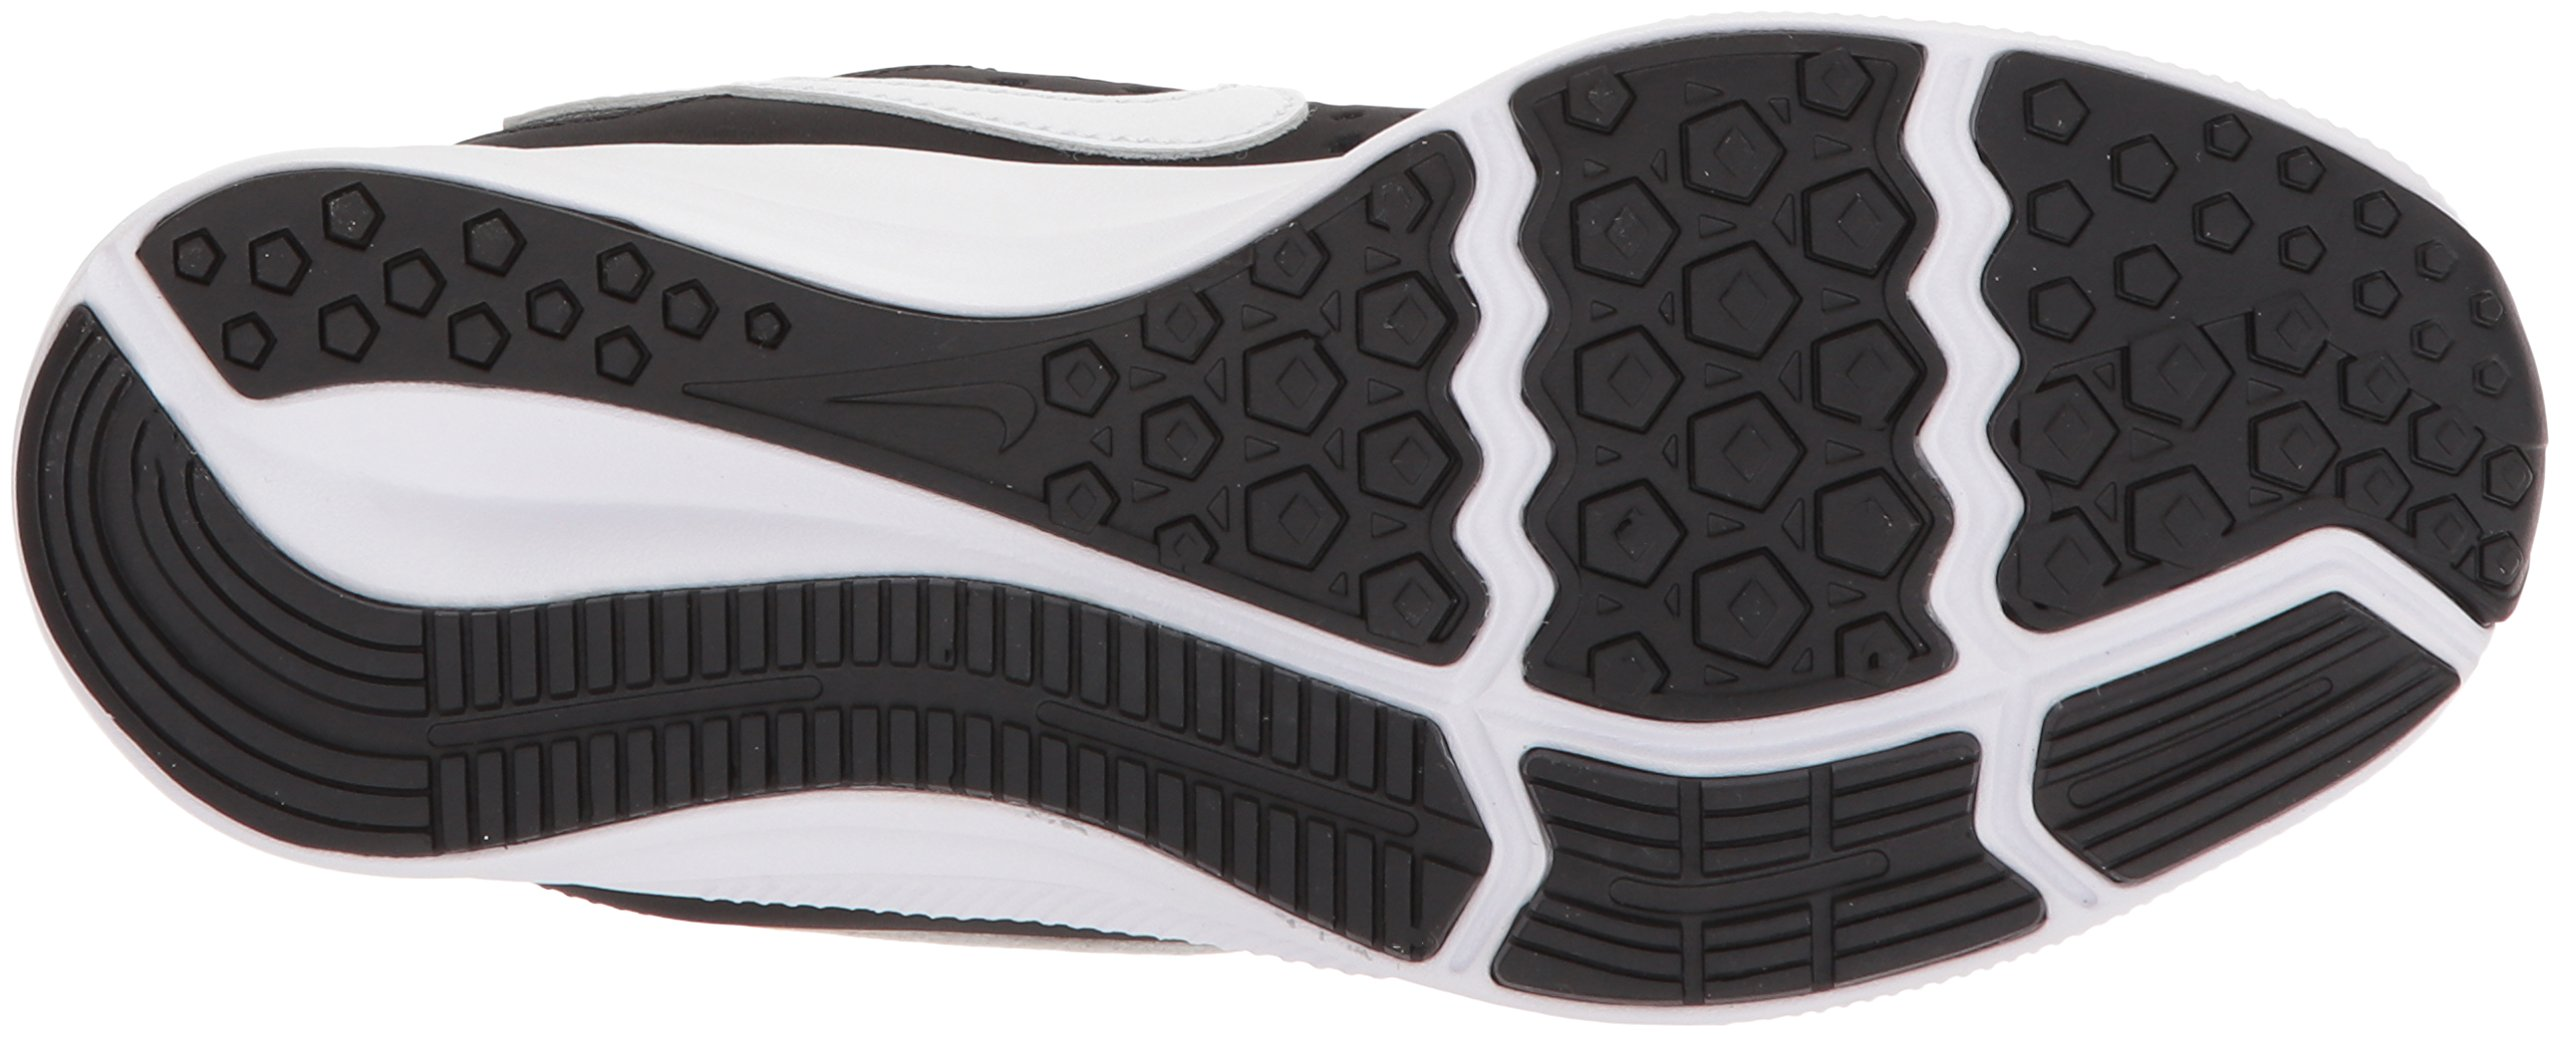 Nike Boys' Downshifter 7 (PSV) Running Shoe, Black/White-Anthracite, 3 M US Little Kid by Nike (Image #3)